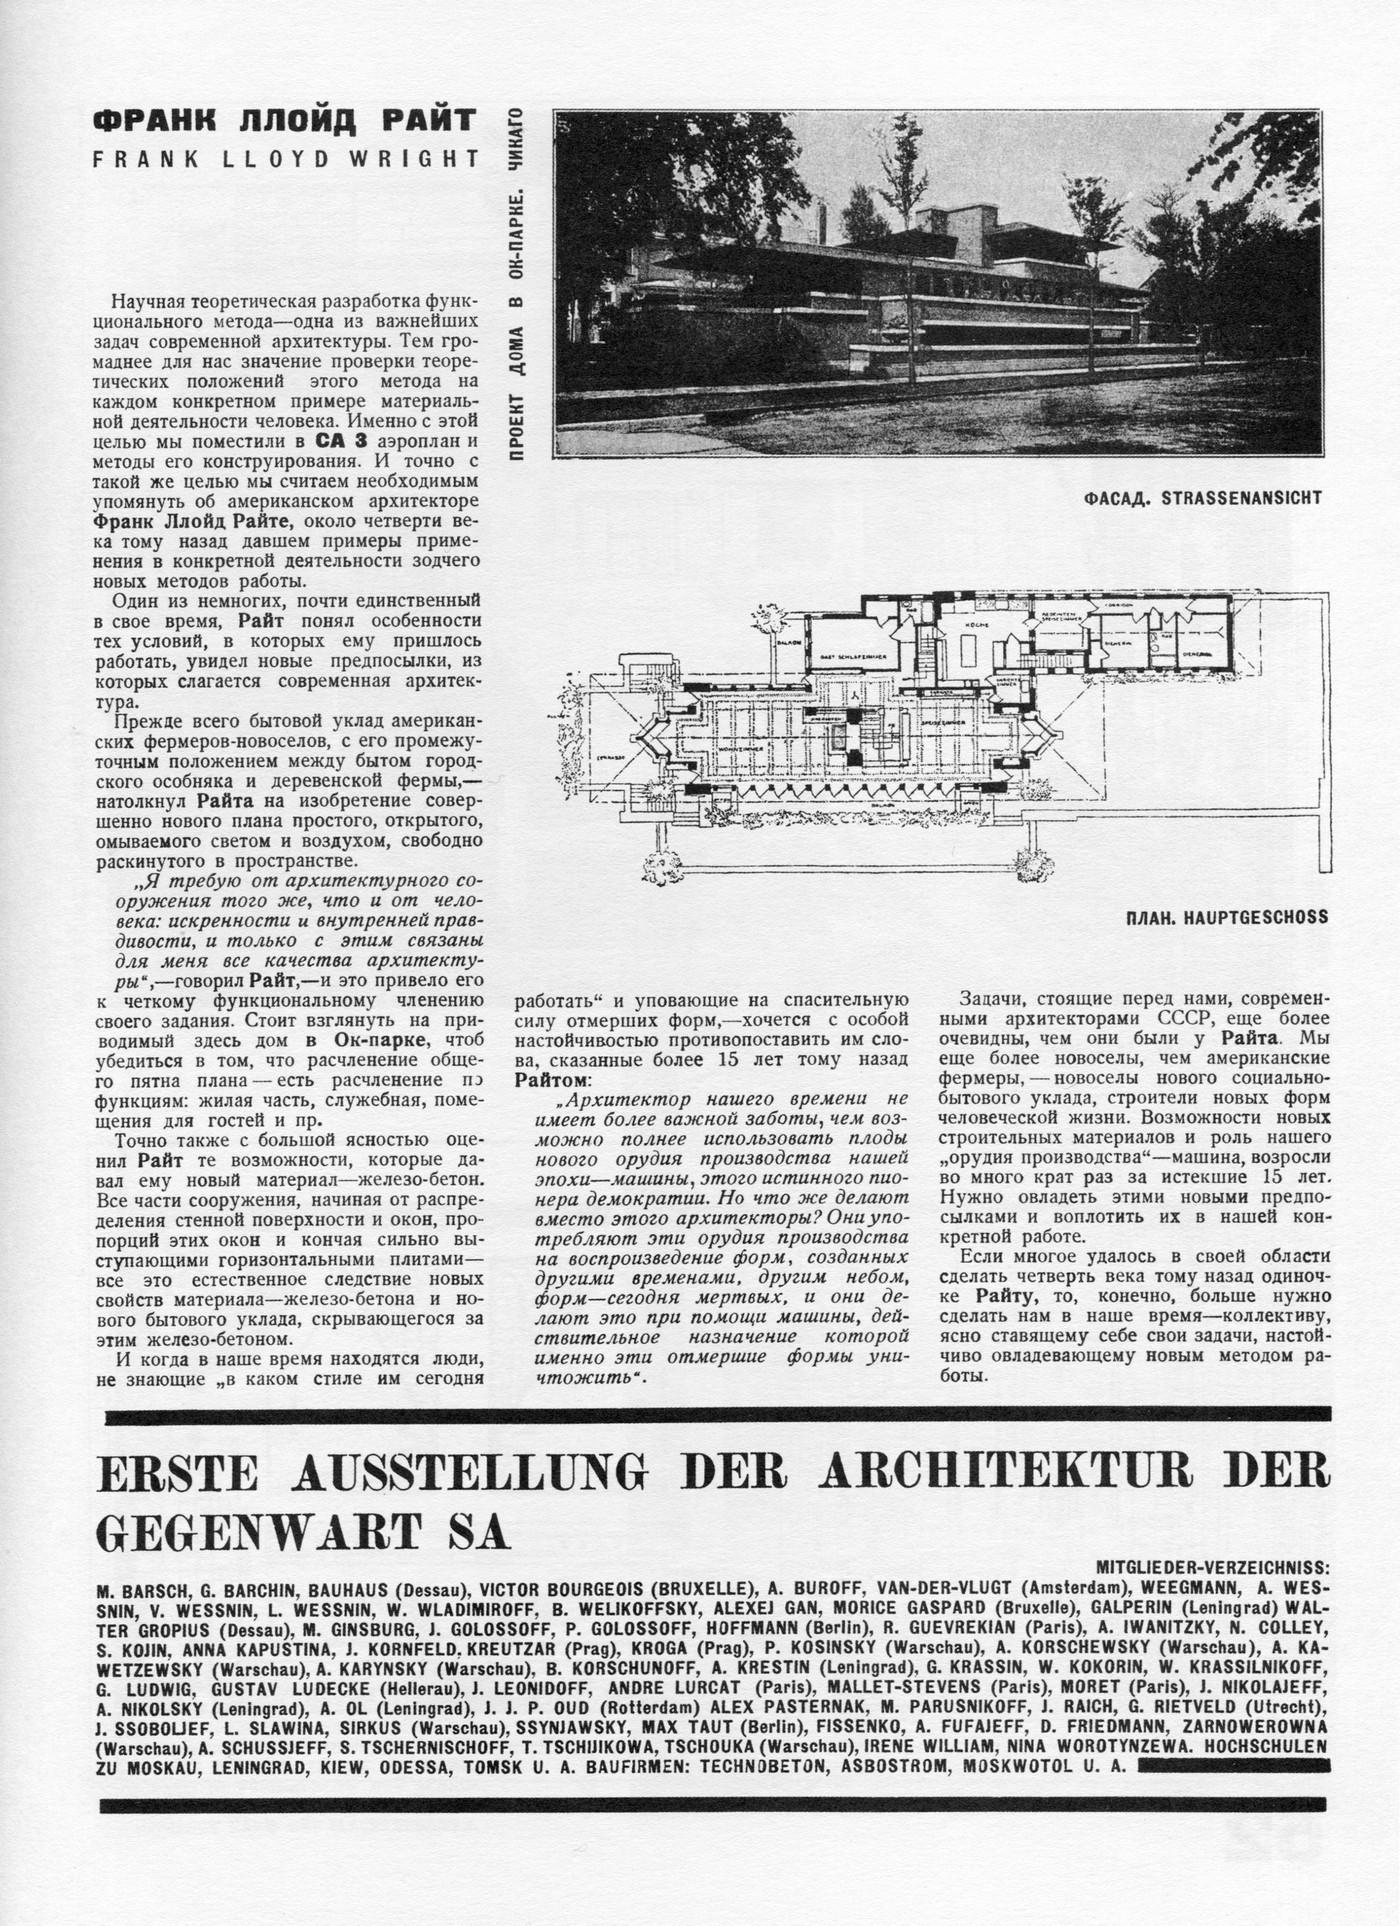 tehne.com-sa-1927-2-1400-007